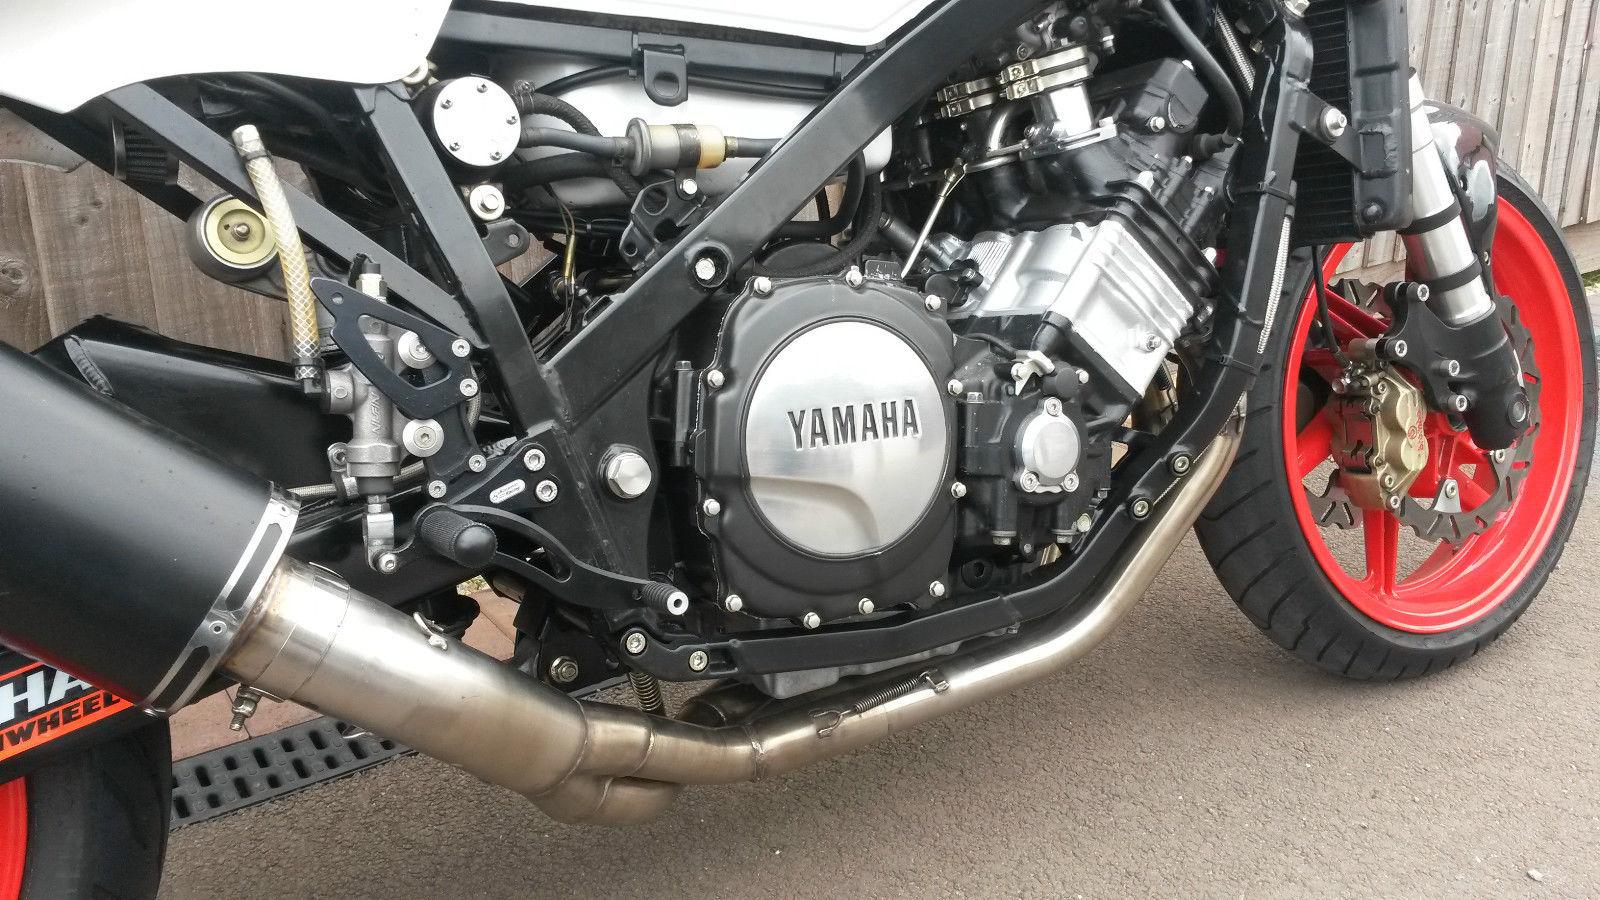 Yamaha Fz 750 2mg - Rocketgarage